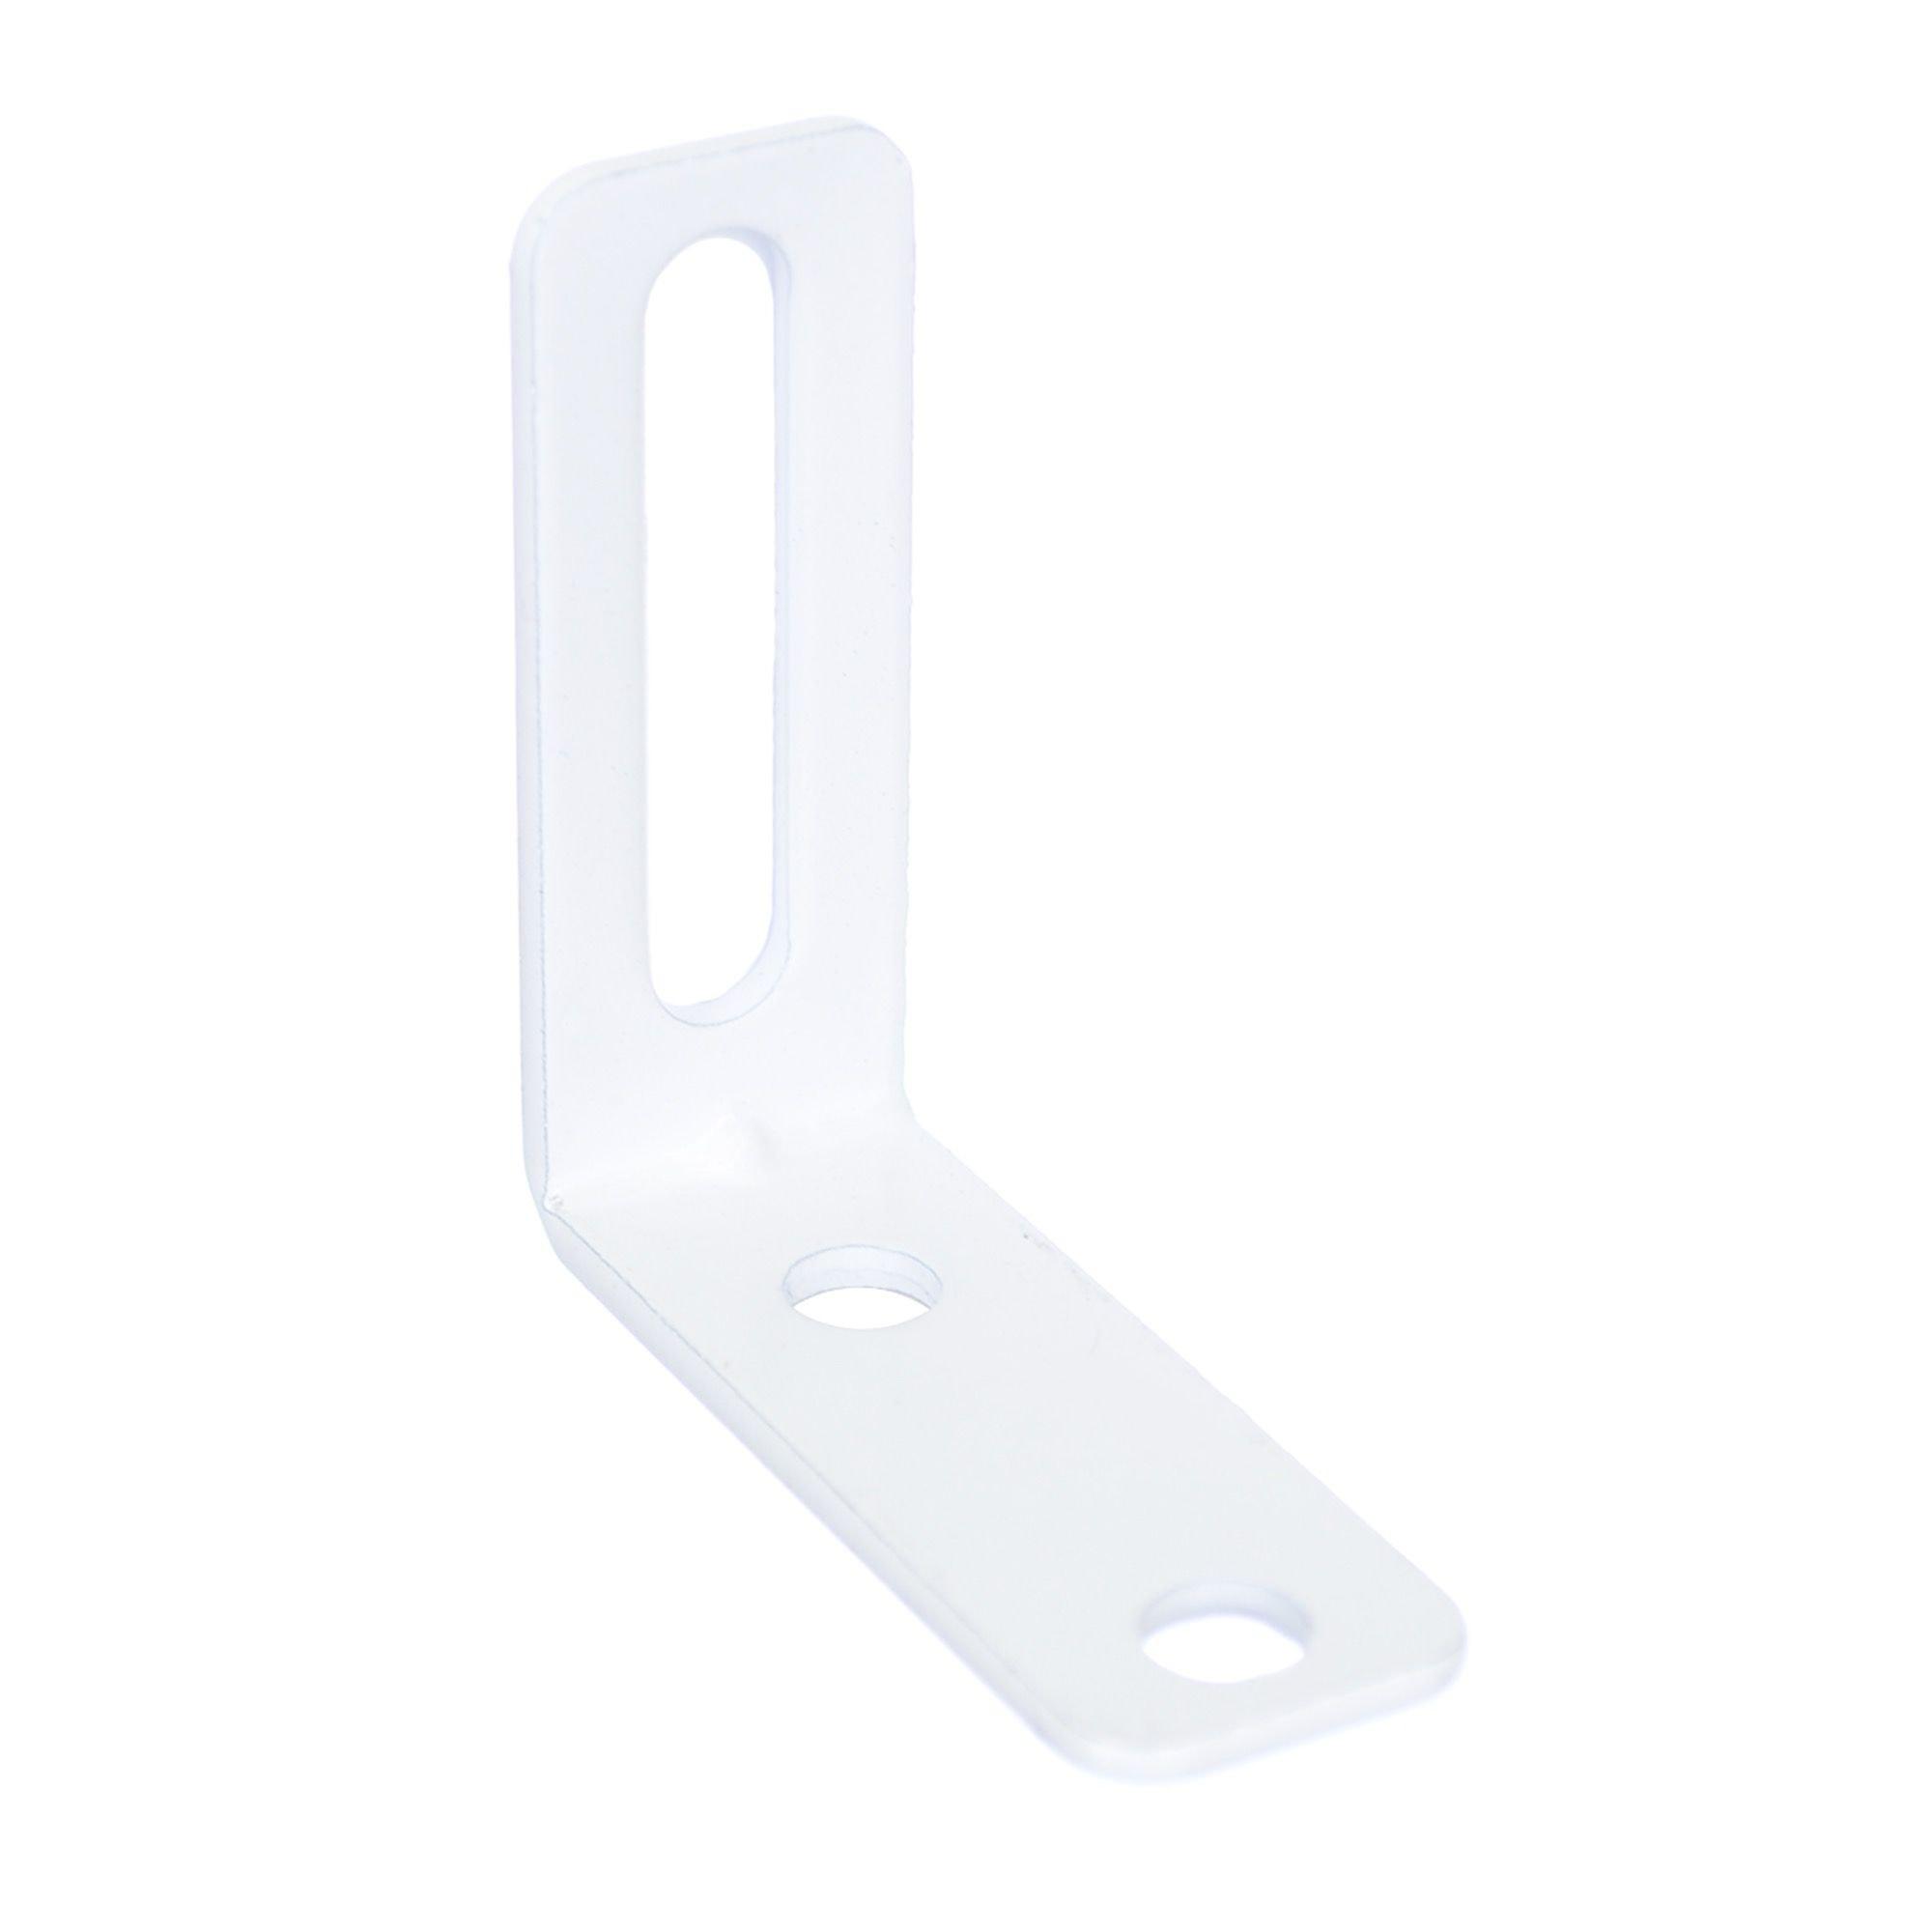 Conector ajustabil alb 55 x 55 x 20 mm